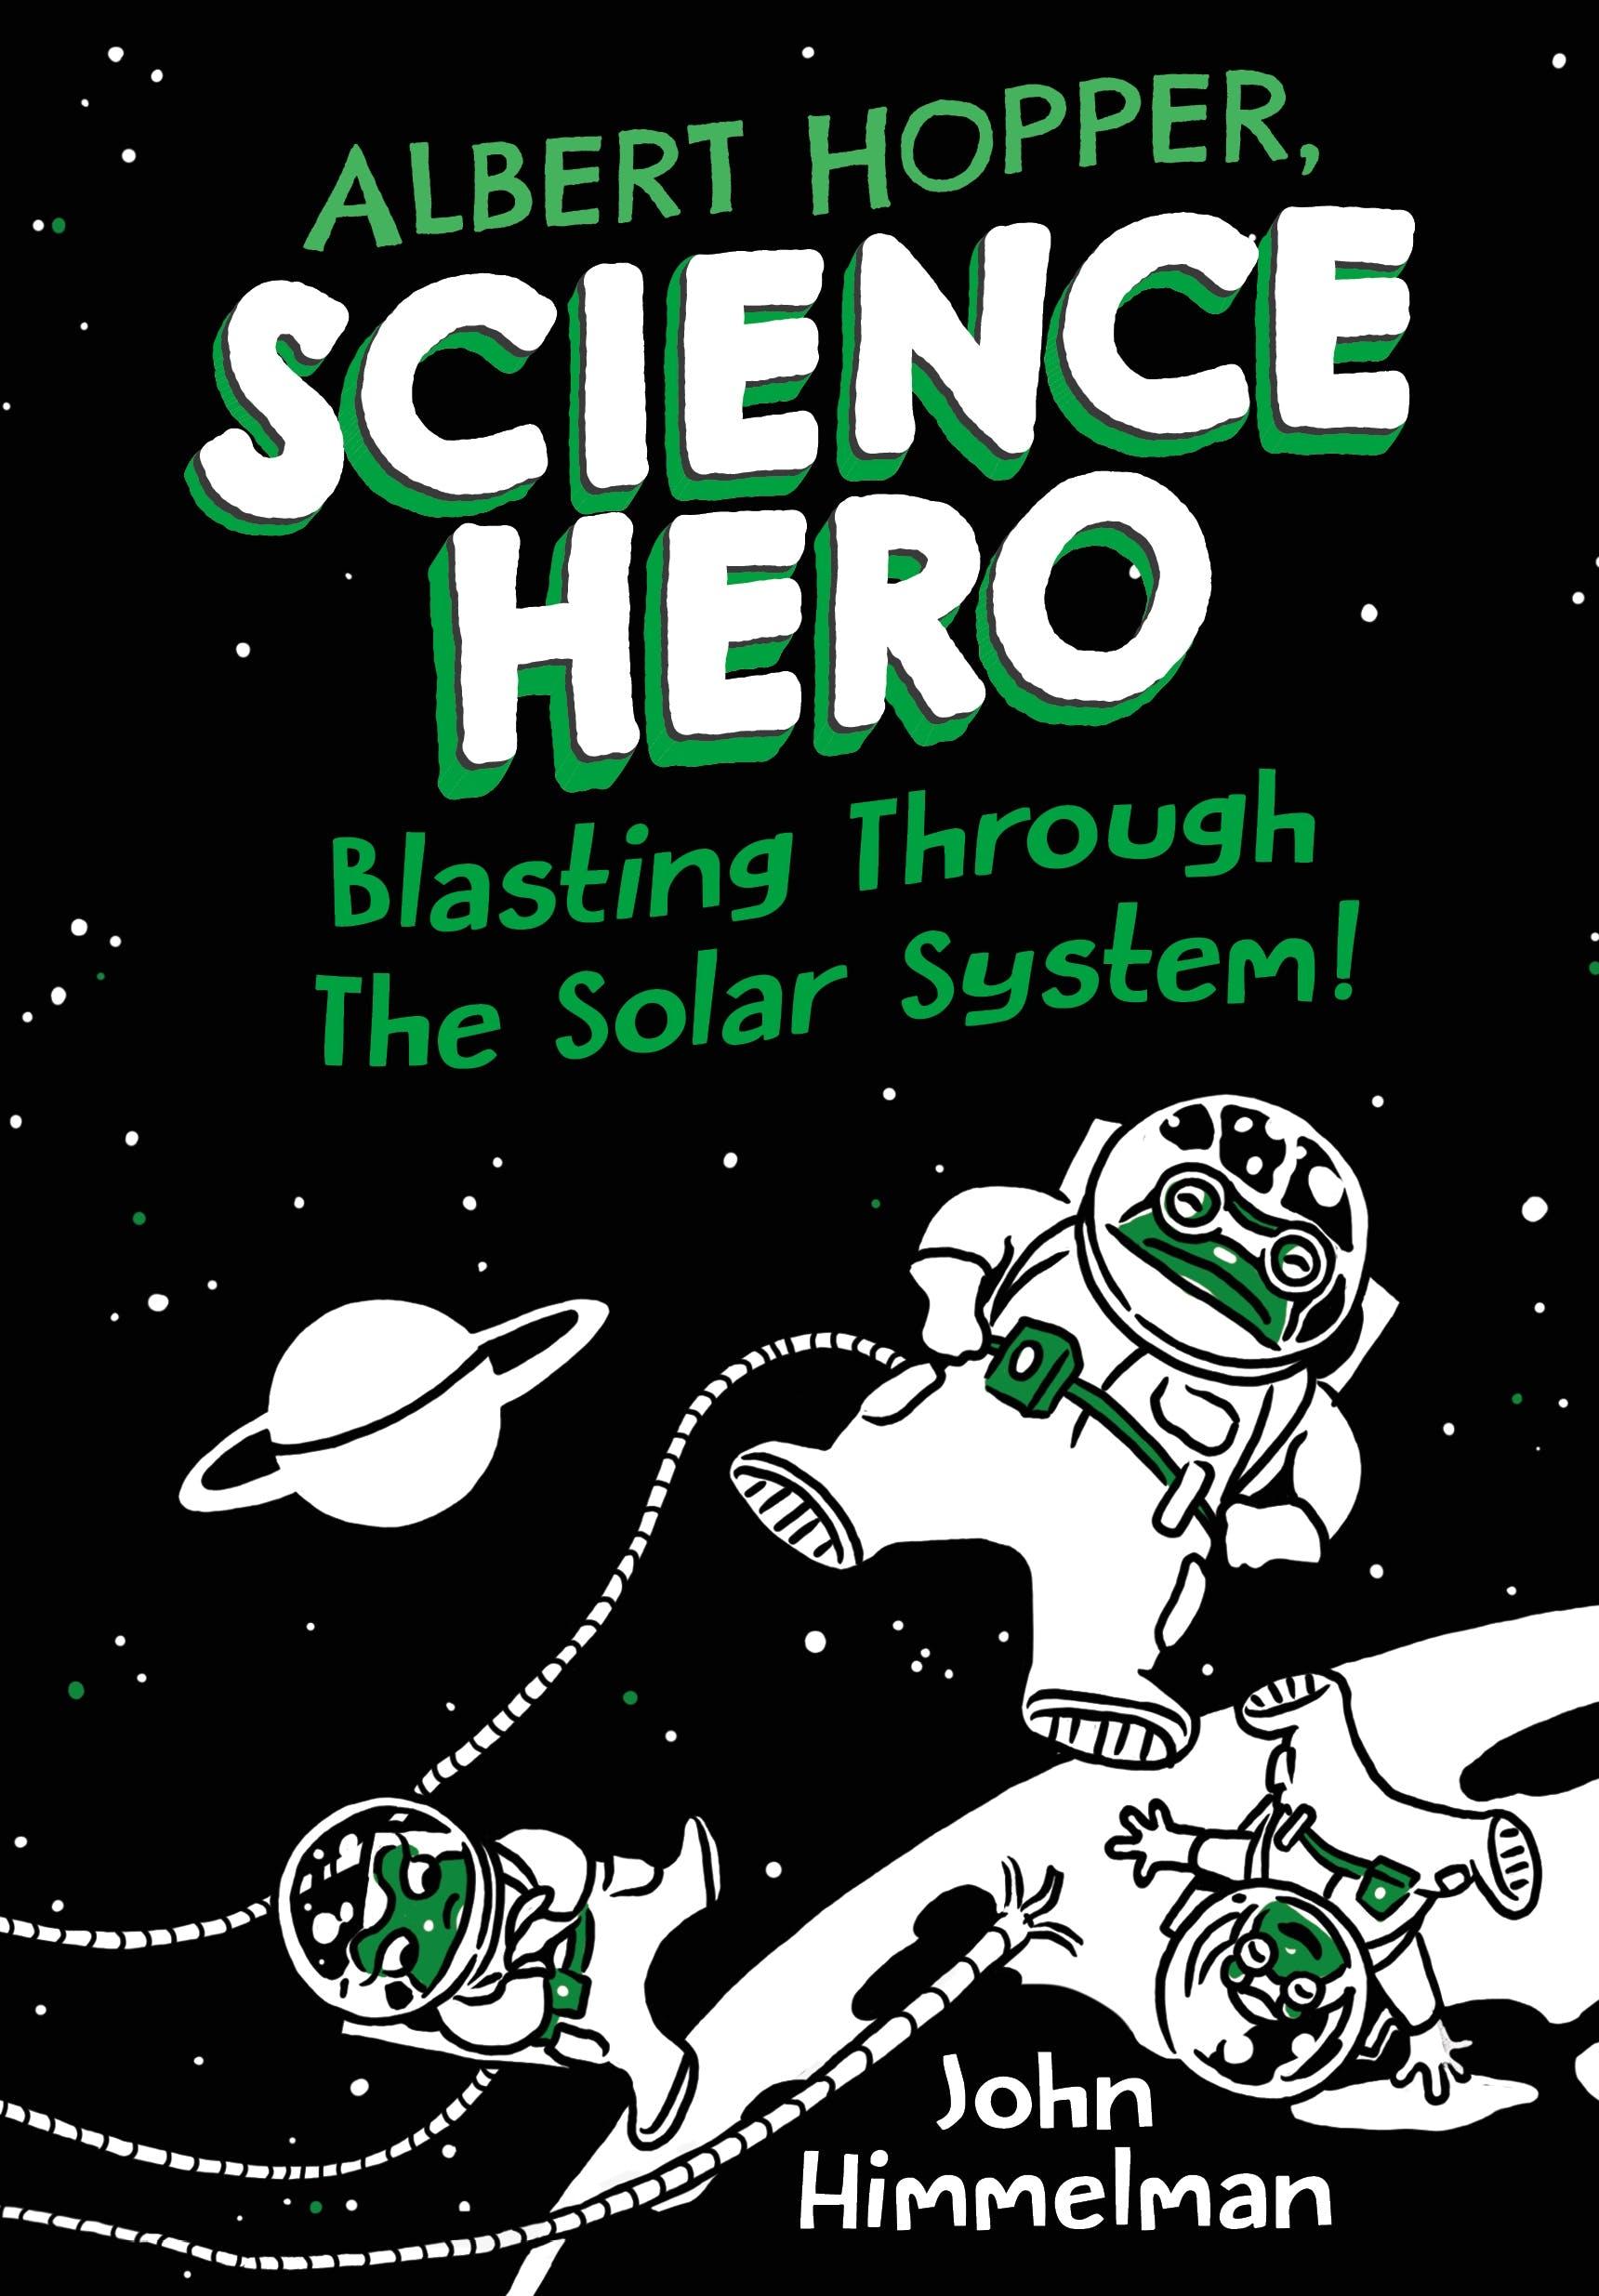 Image of Albert Hopper, Science Hero: Blasting Through the Solar System!